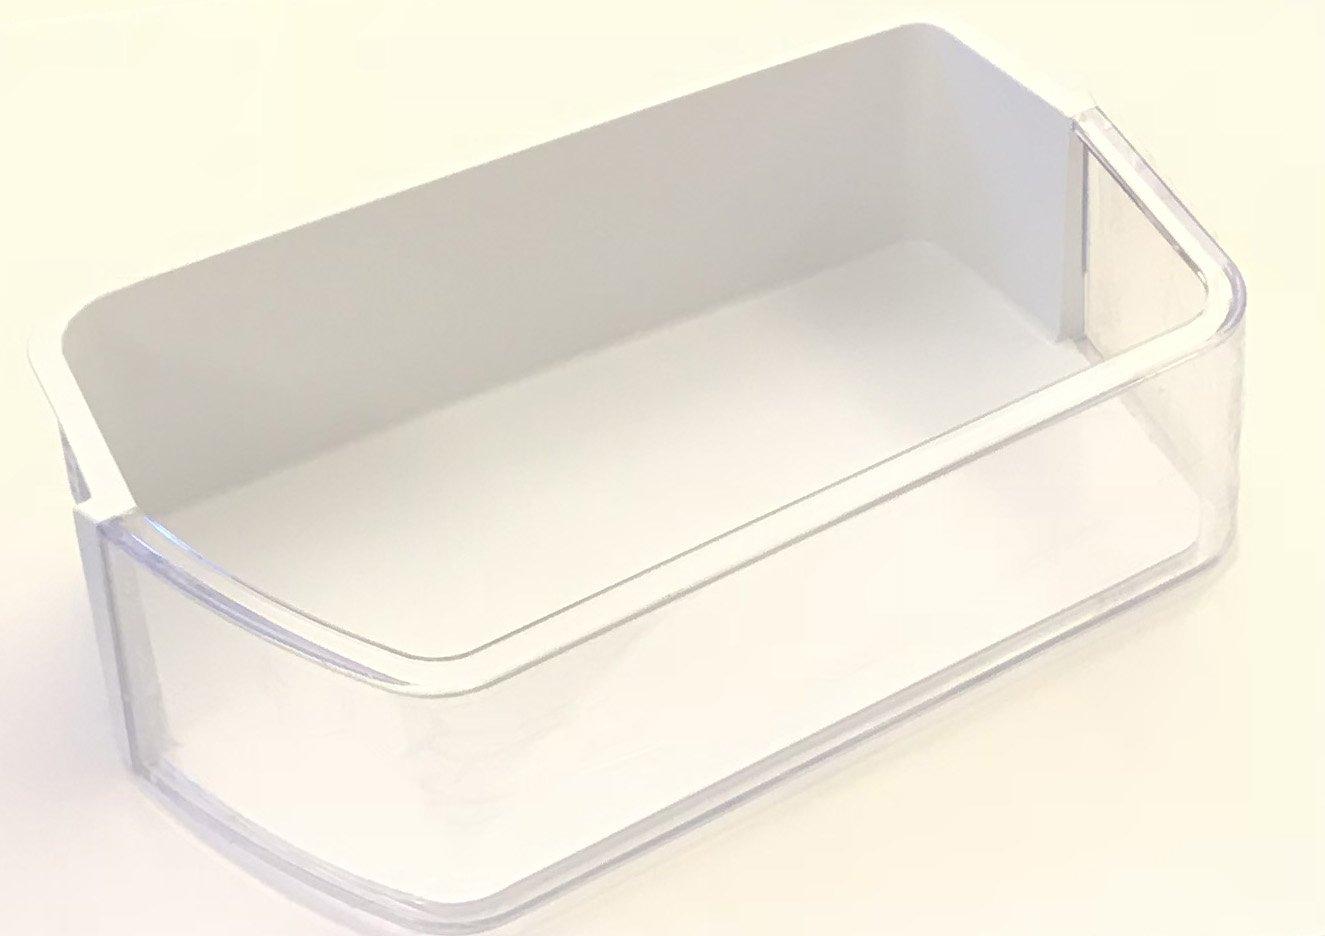 OEM Samsung Refrigerator Door Bin Basket Shelf Tray For Samsung Models RF260BEAESR/AA, RF260BEAESR/AA-0001, RF260BEAEWW/AA, RF260BEAEWW/AA-0001